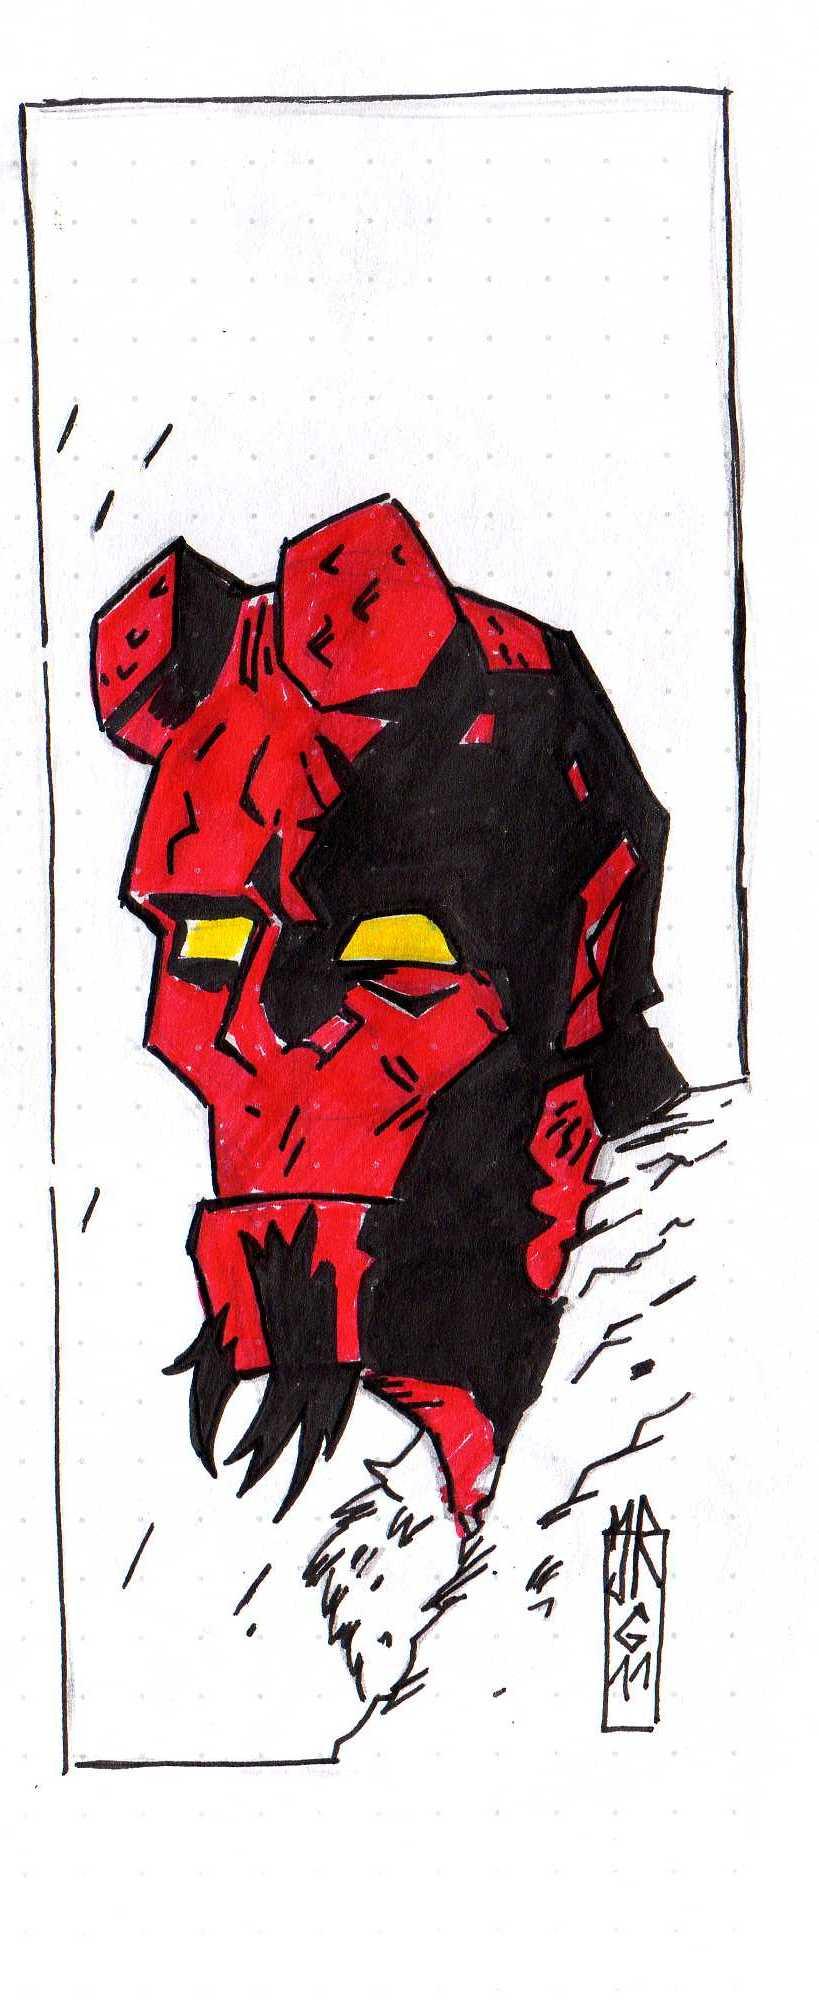 I'ts Hellboy again by jacksony22